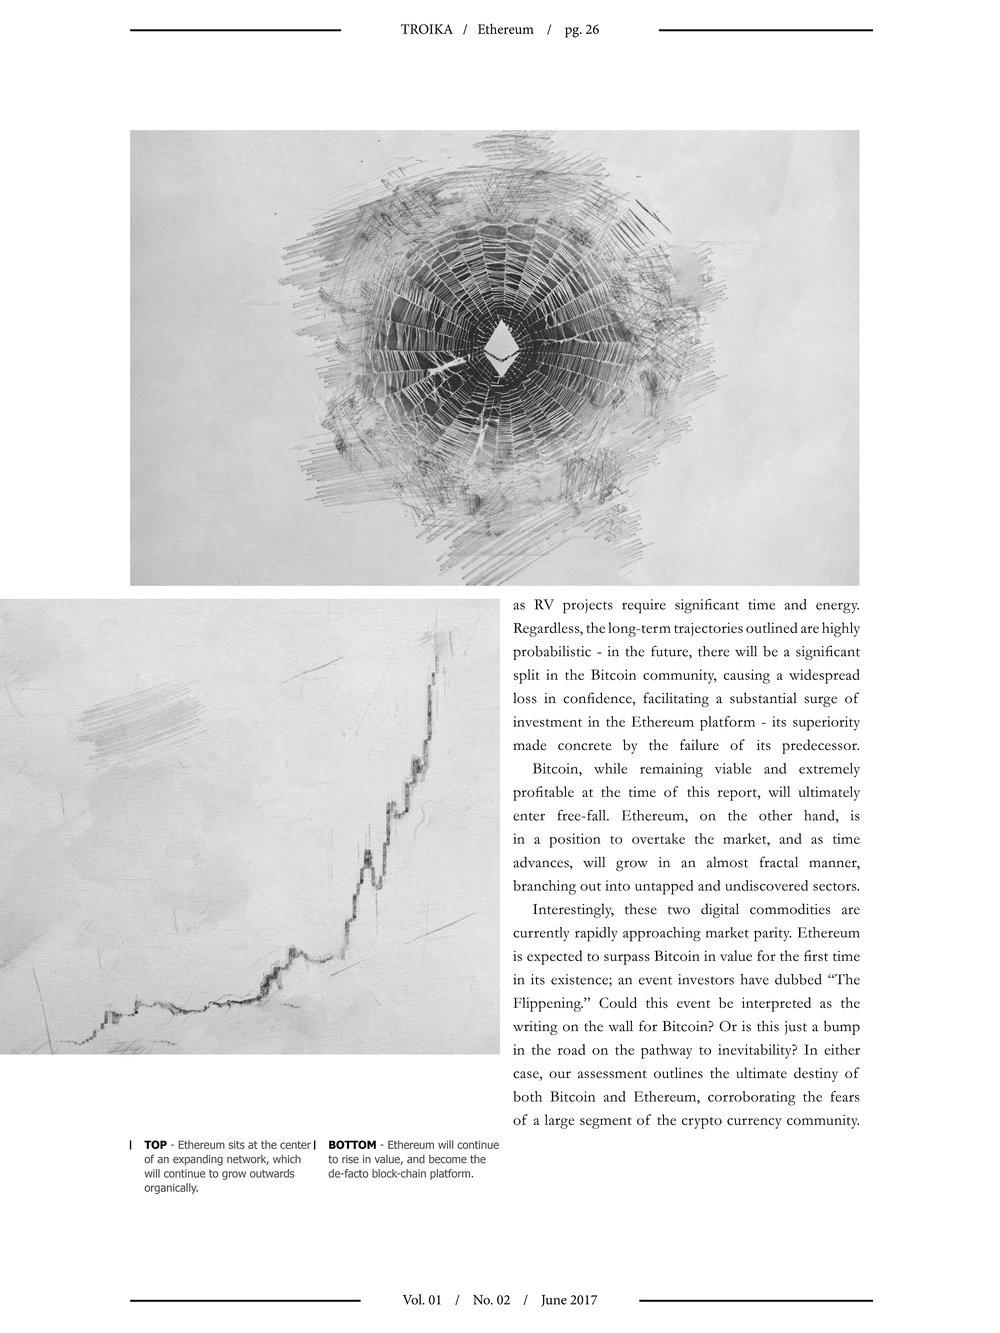 TROIKA-Ethereum-Report-26.jpg